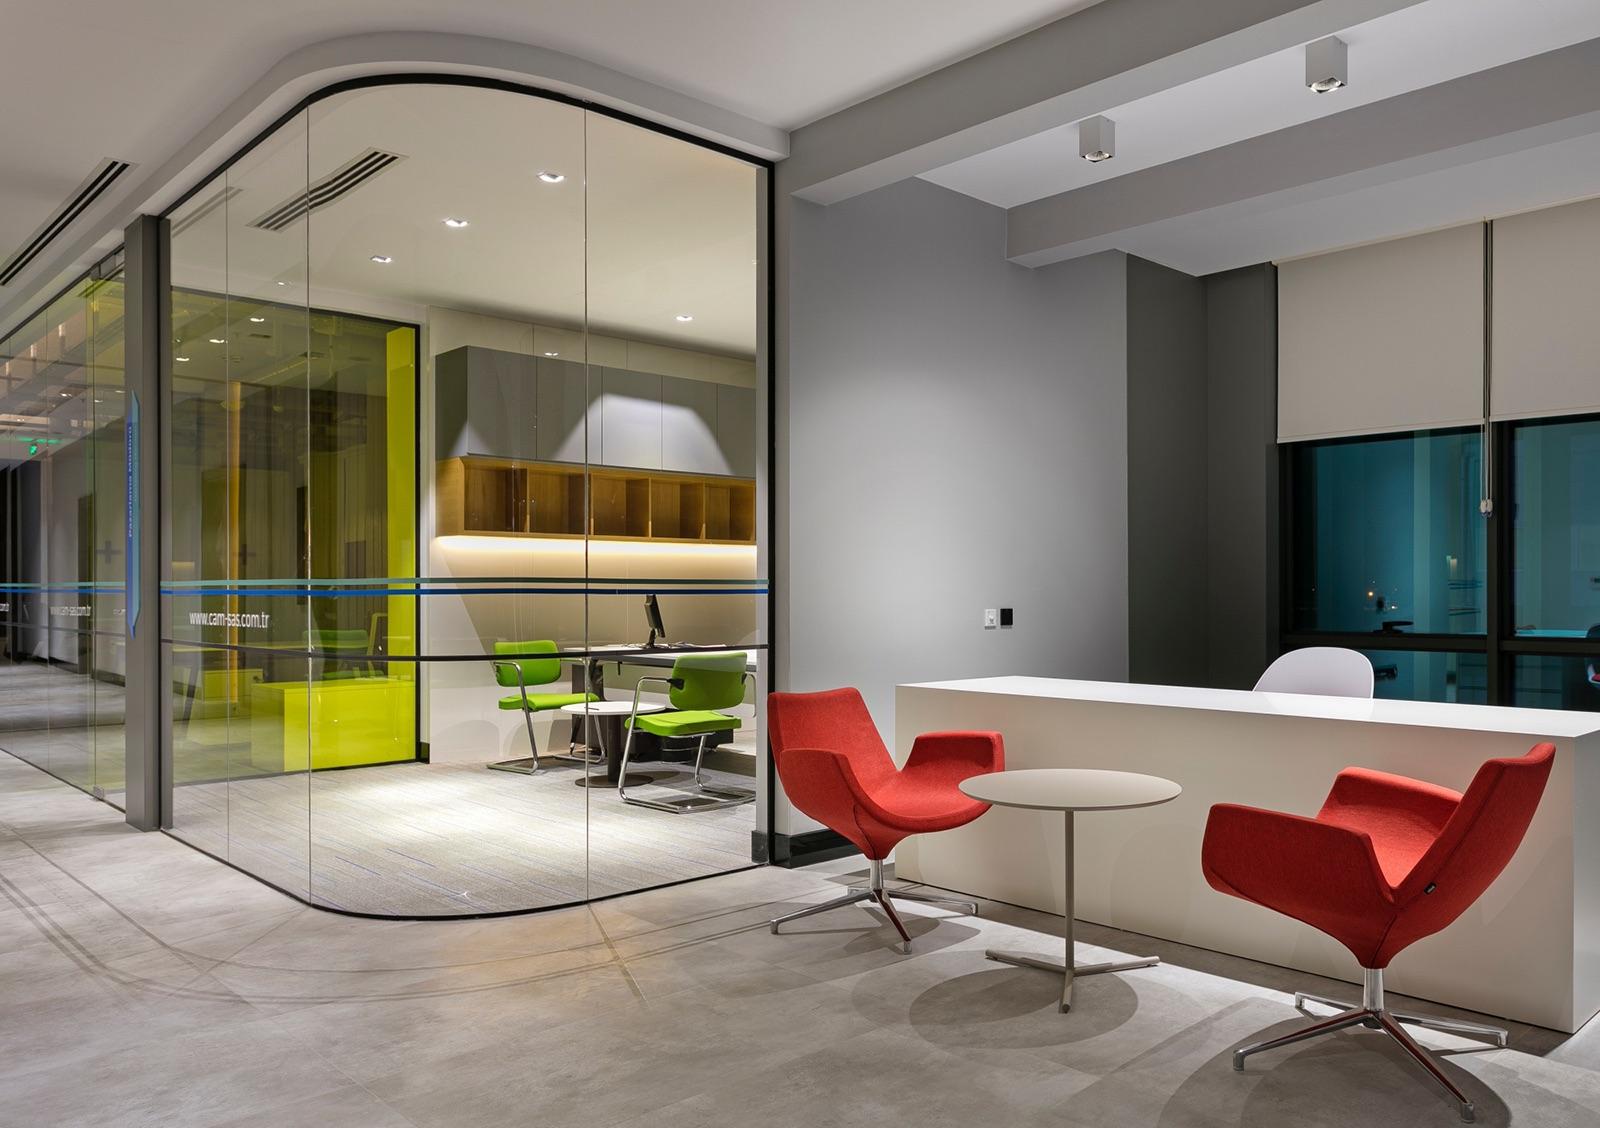 KST Architecture & Interiors